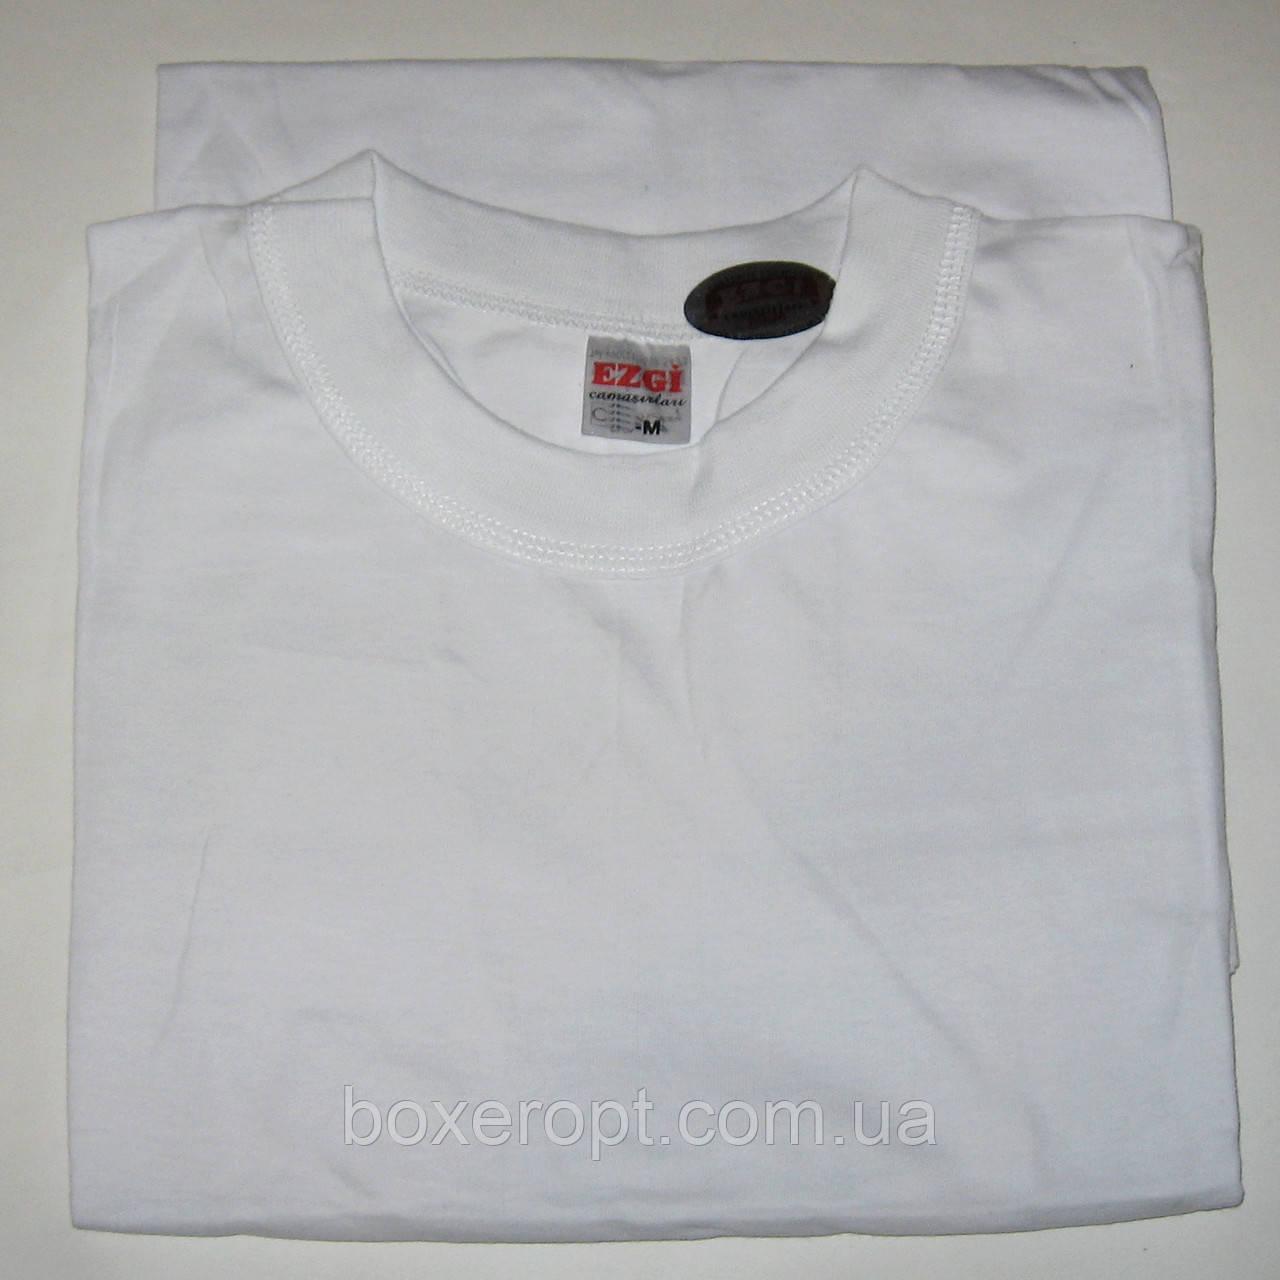 Мужские футболки Ezgi - 35.00 грн./шт. (54-й размер, белые)